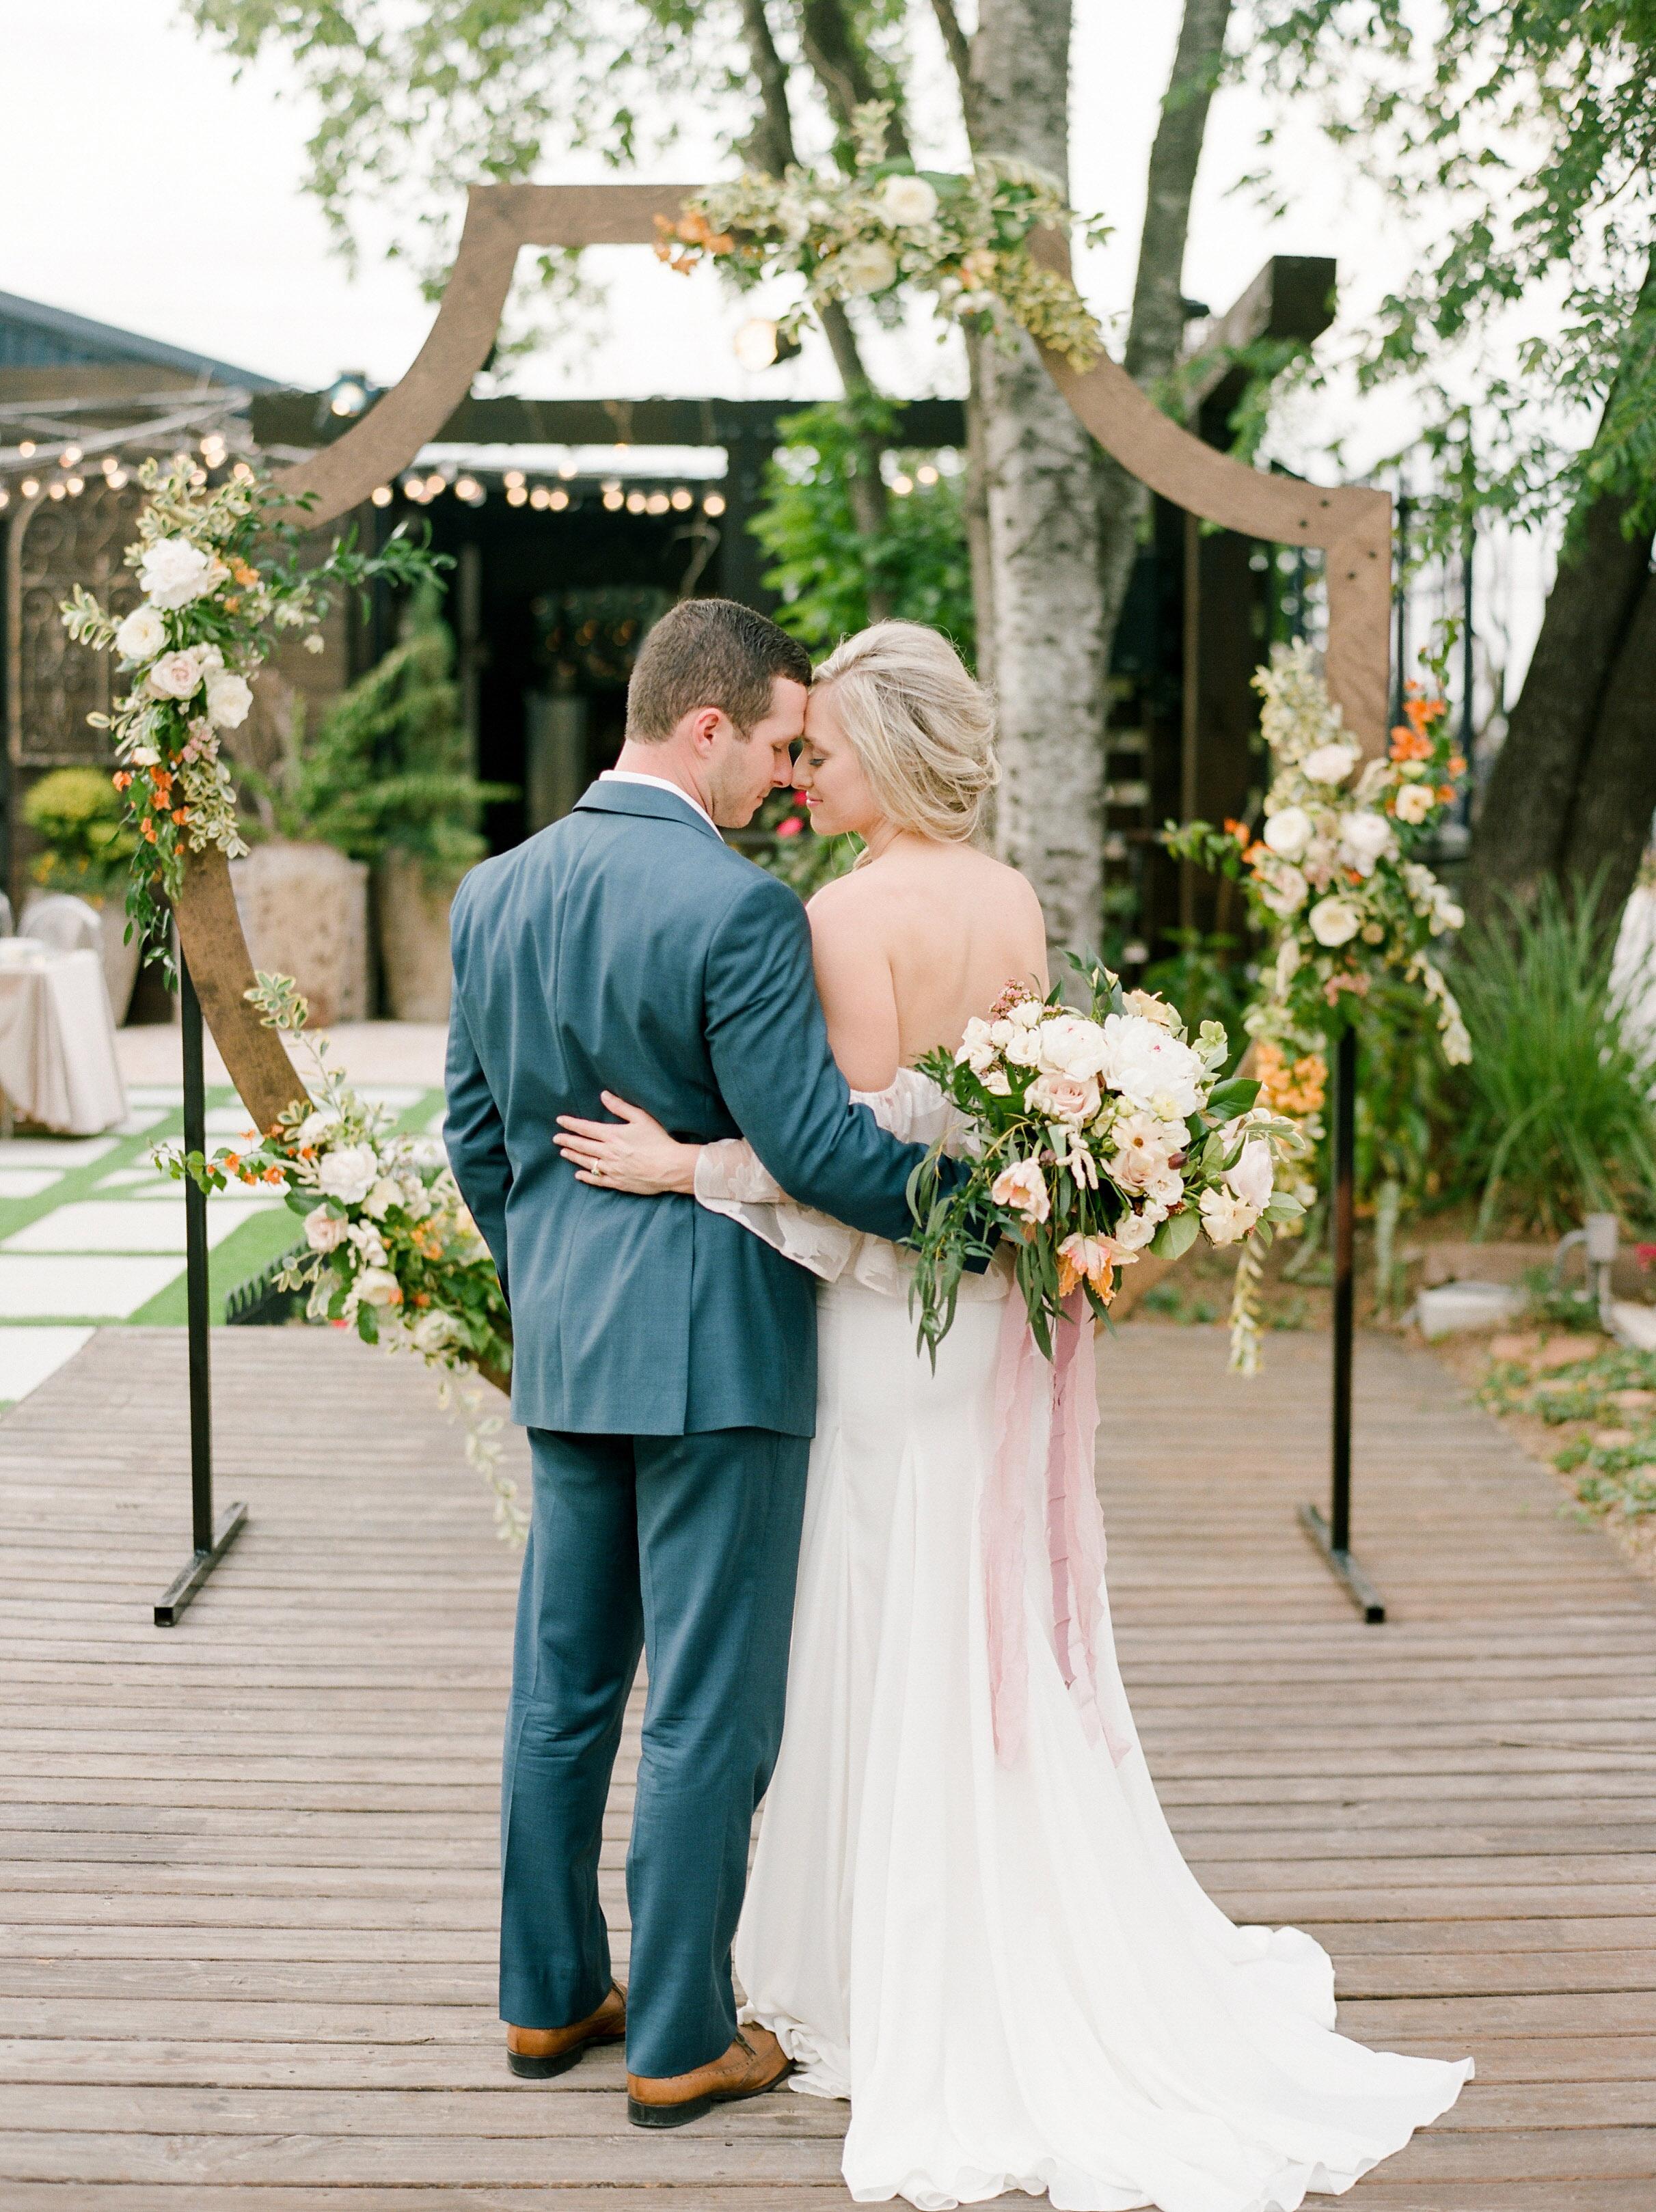 Houston-Wedding-Photographer-Fine-Art-Film-Destination-Style-Me-Pretty-Austin-Dallas-New-Orleans-Dana-Fernandez-Photography-13.jpg